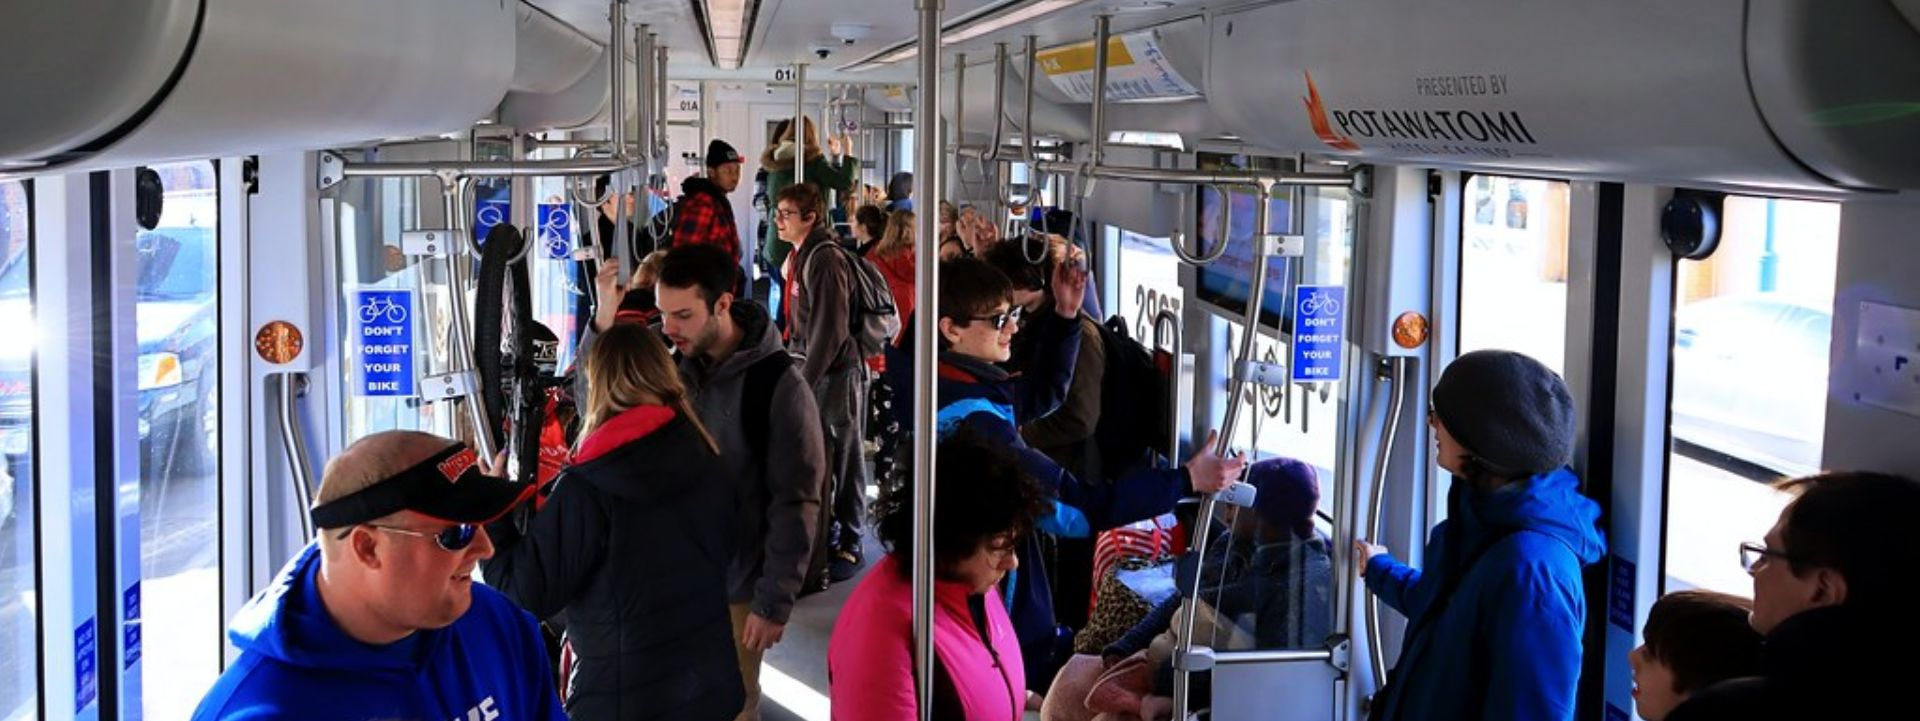 Riders inside a streetcar